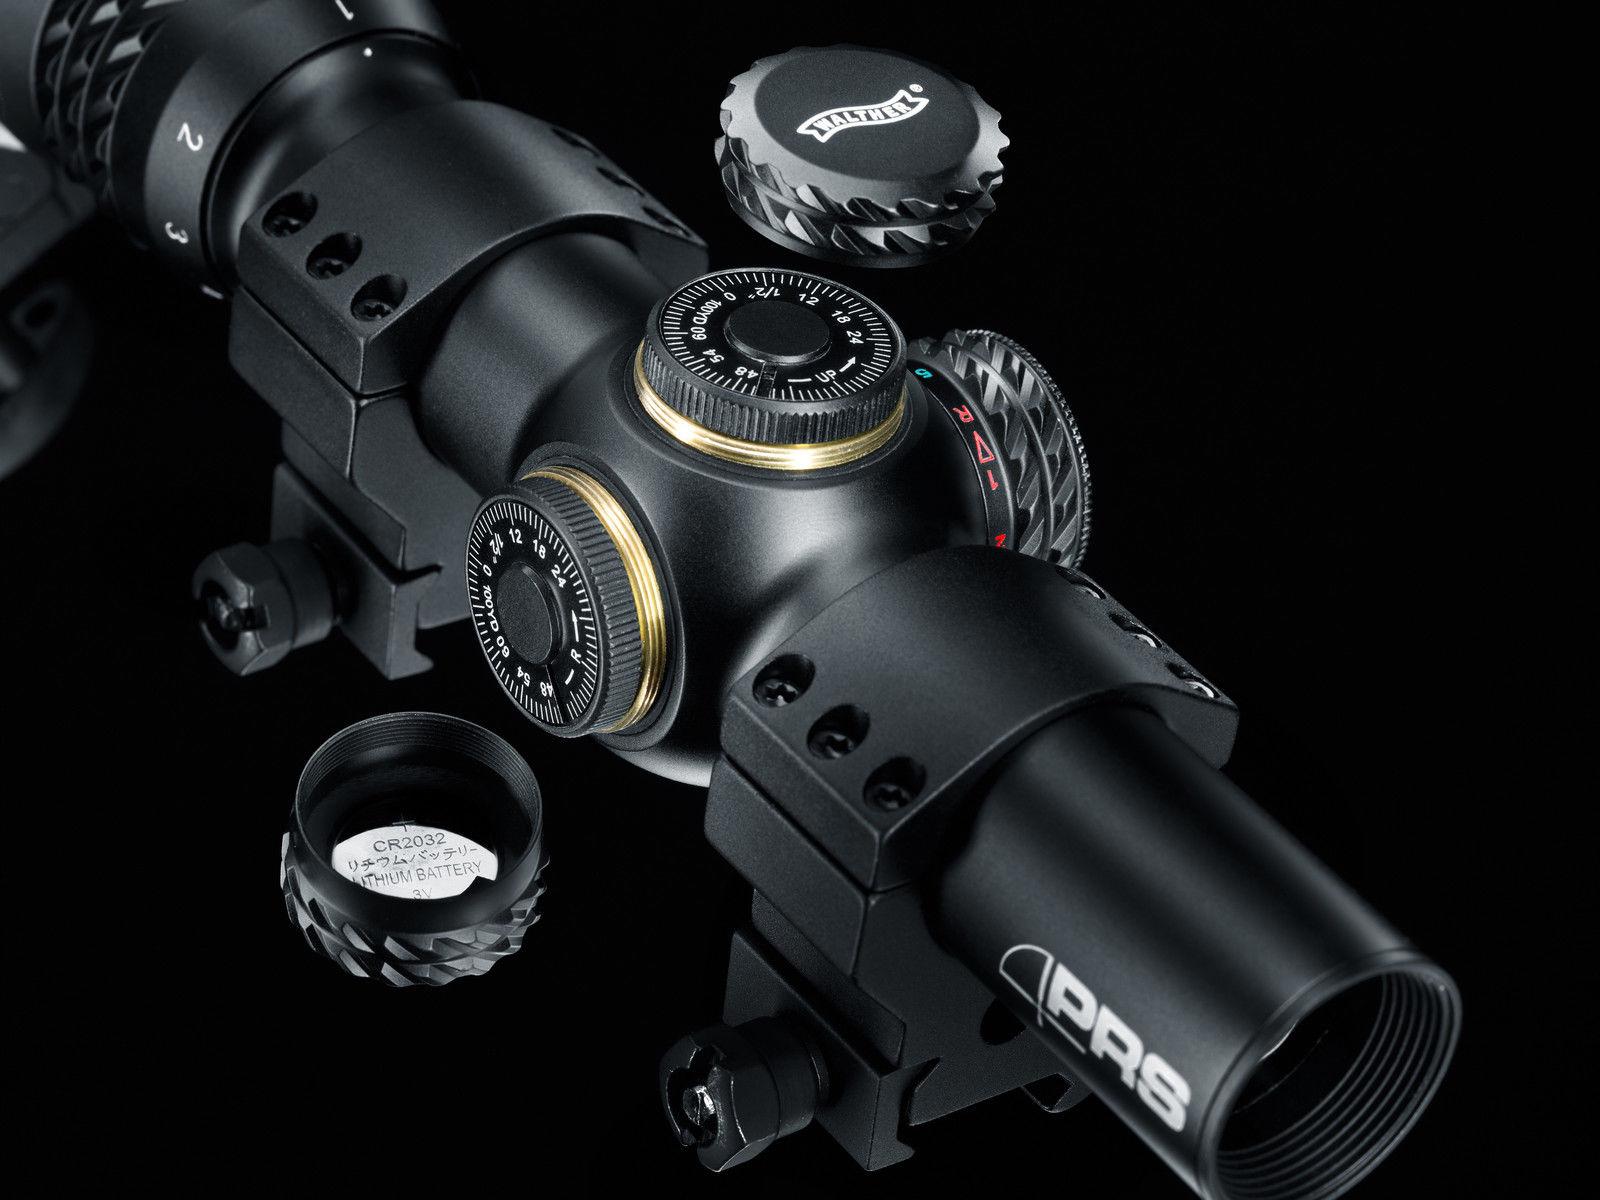 Walther prs 5 30x56 igr zielfernrohr beleuchtet neu ovp ebay